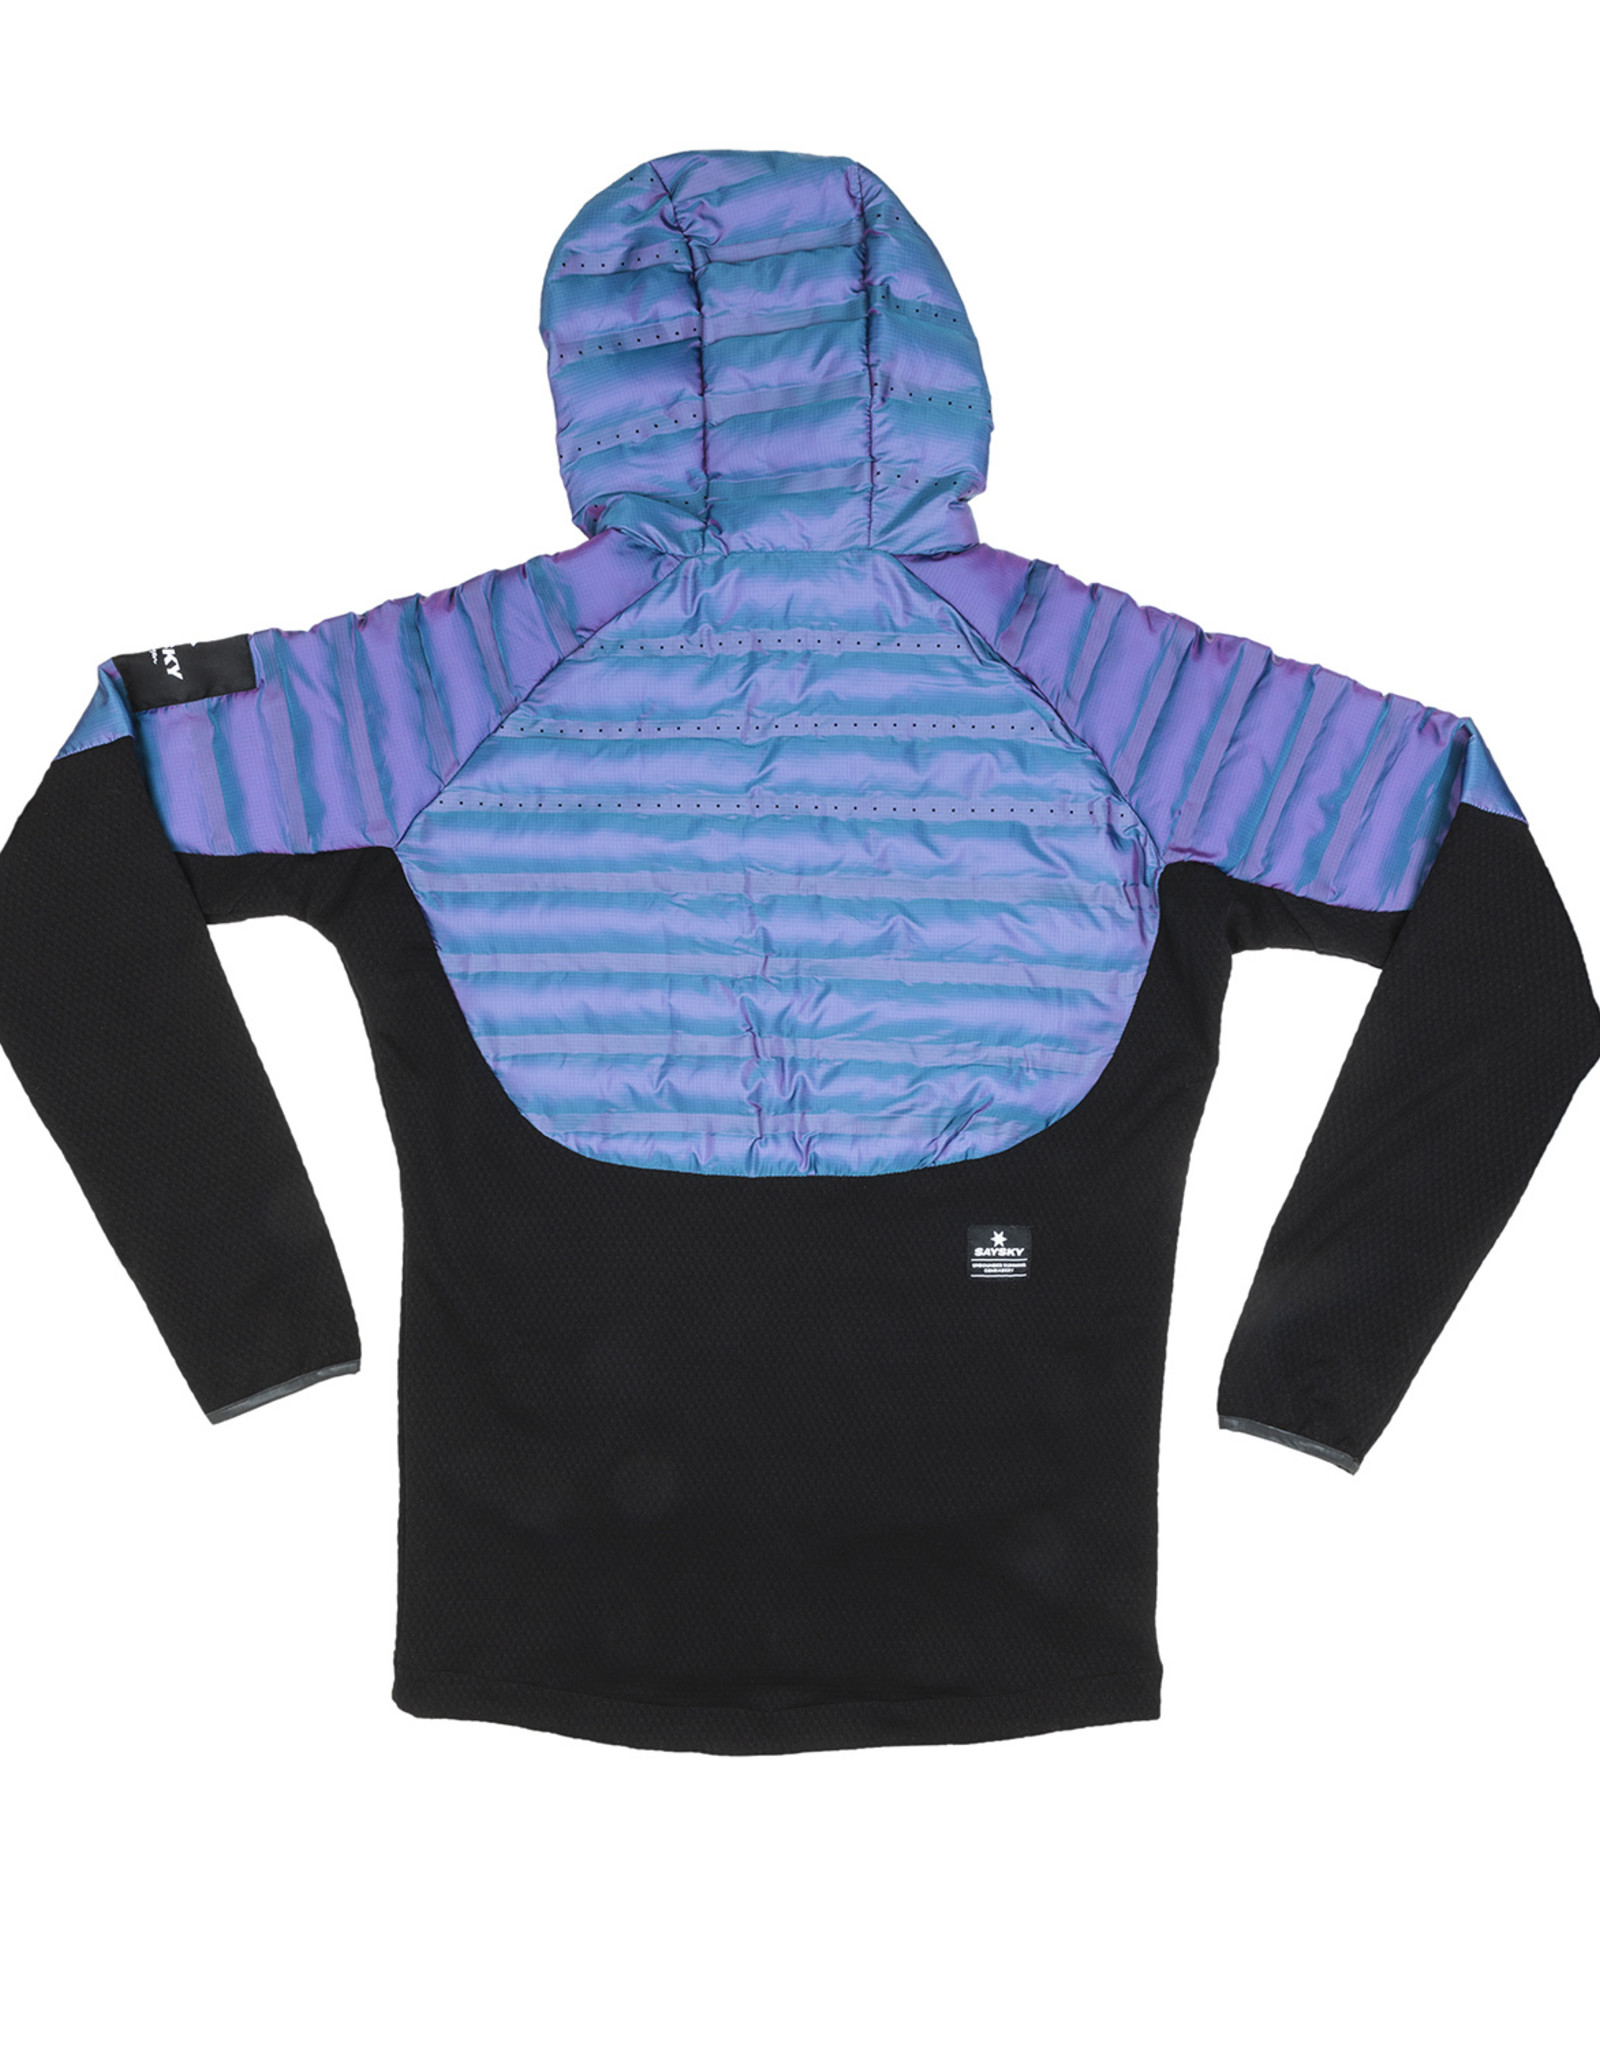 Saysky Clean Blaze jacket unisex (ref EMRJA07)